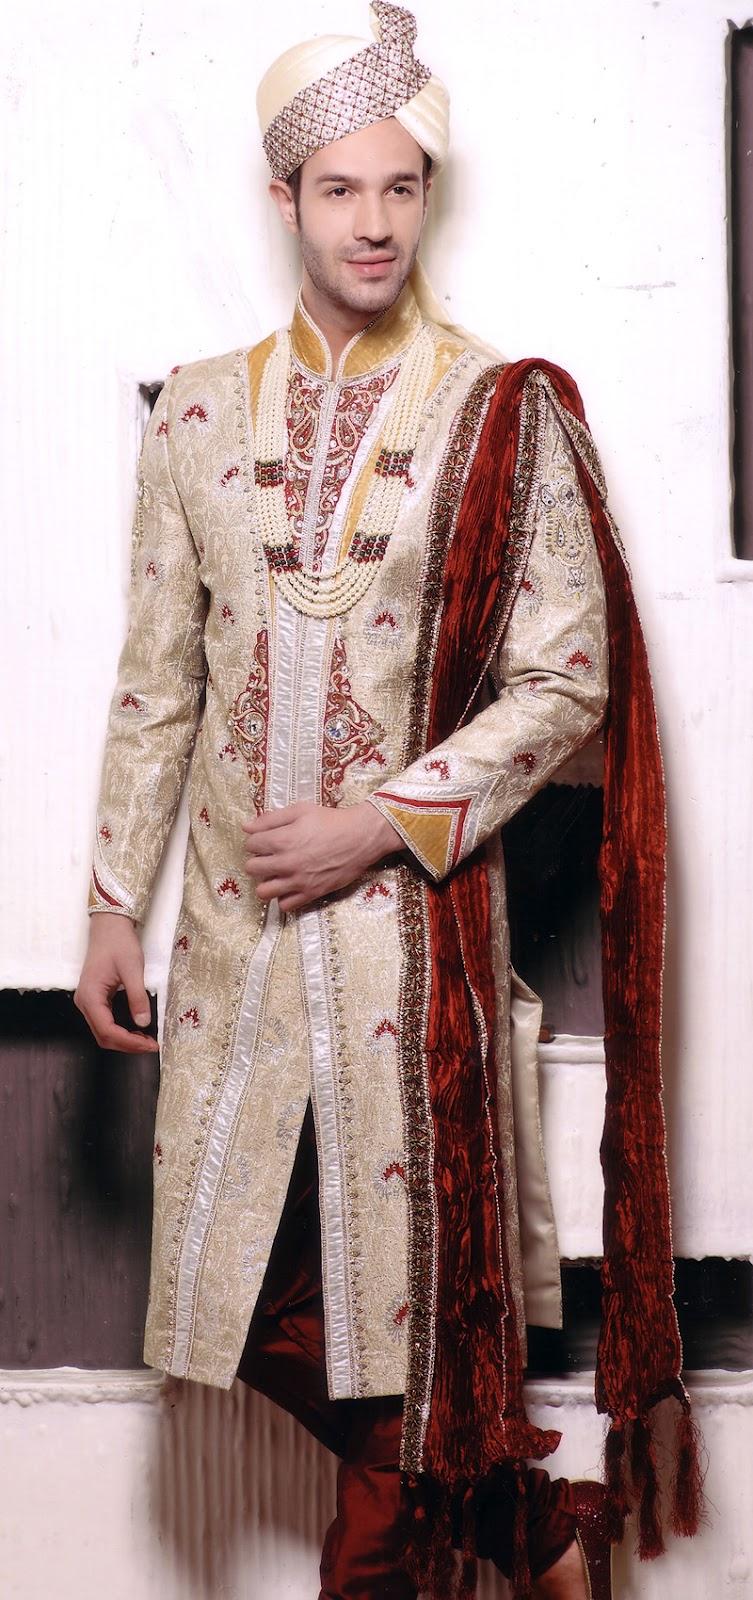 designer wedding sherwani - photo #38